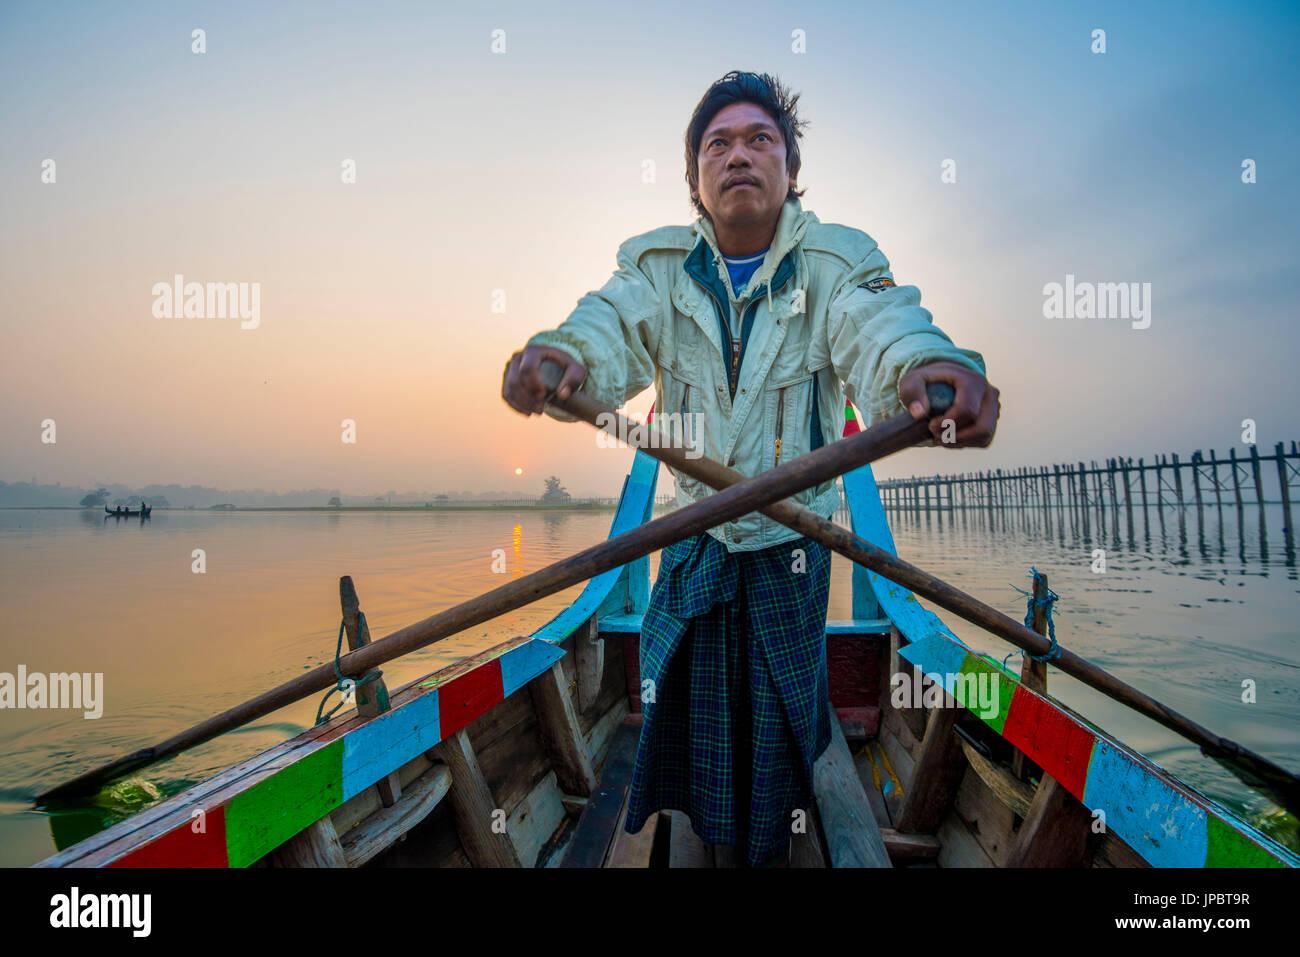 Amarapura, Mandalay region, Myanmar. Man rowing on his colorful boat  on the Taungthaman lake  at sunrise, with - Stock Image